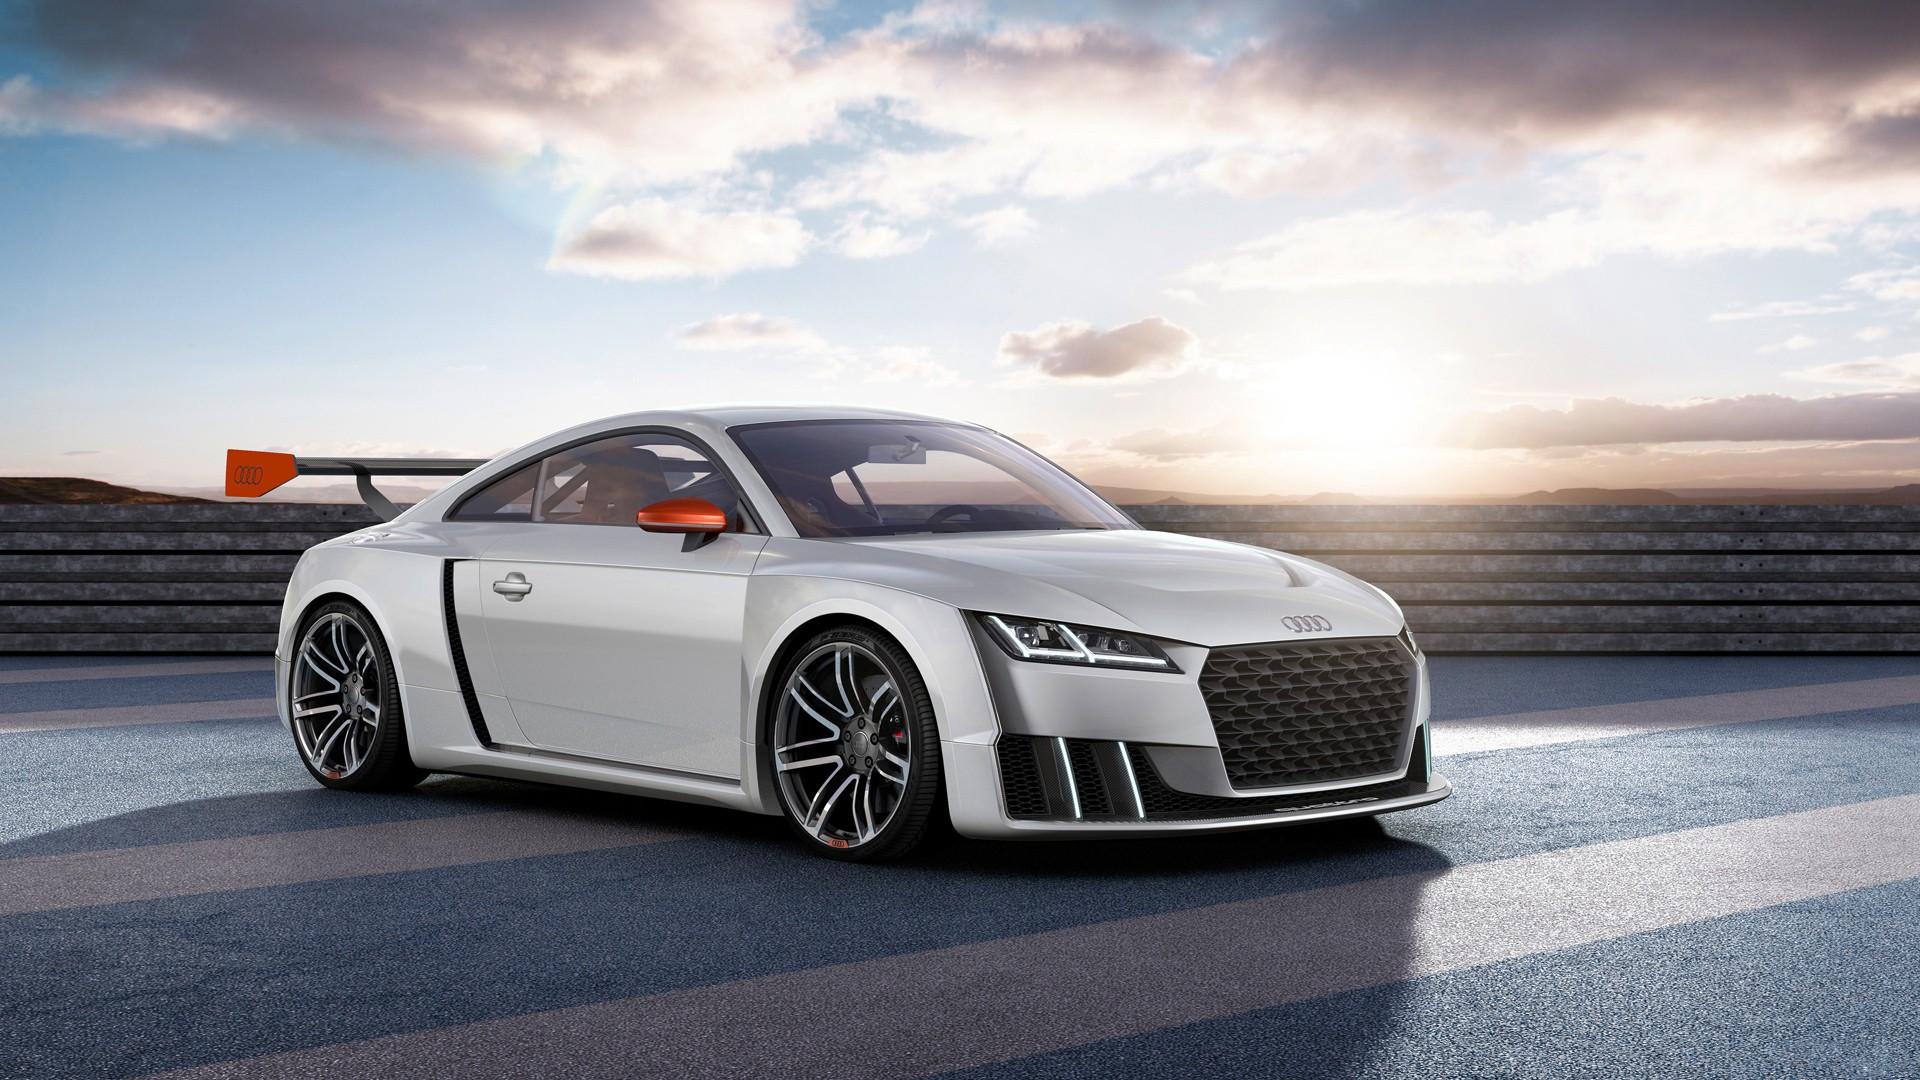 Car Concept Cars Vehicle Audi Sports Car Audi R8 Coupe Audi TT Wheel  Supercar Land Vehicle